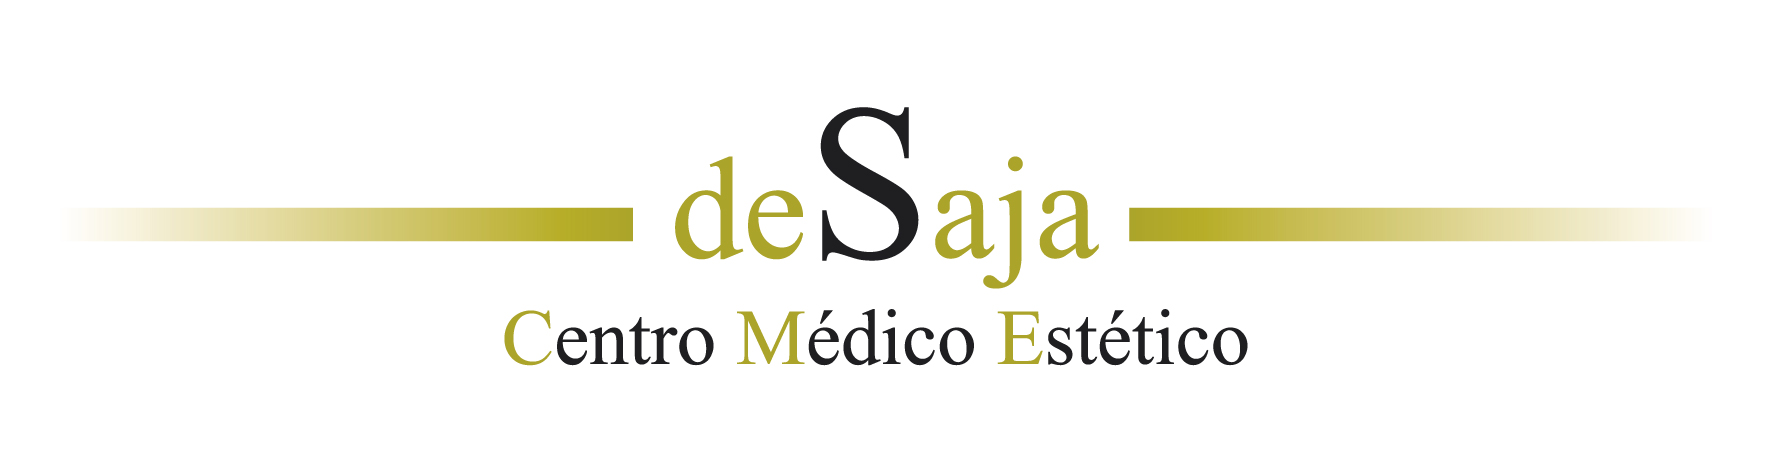 CENTRO MÉDICO ESTÉTICO de SAJA